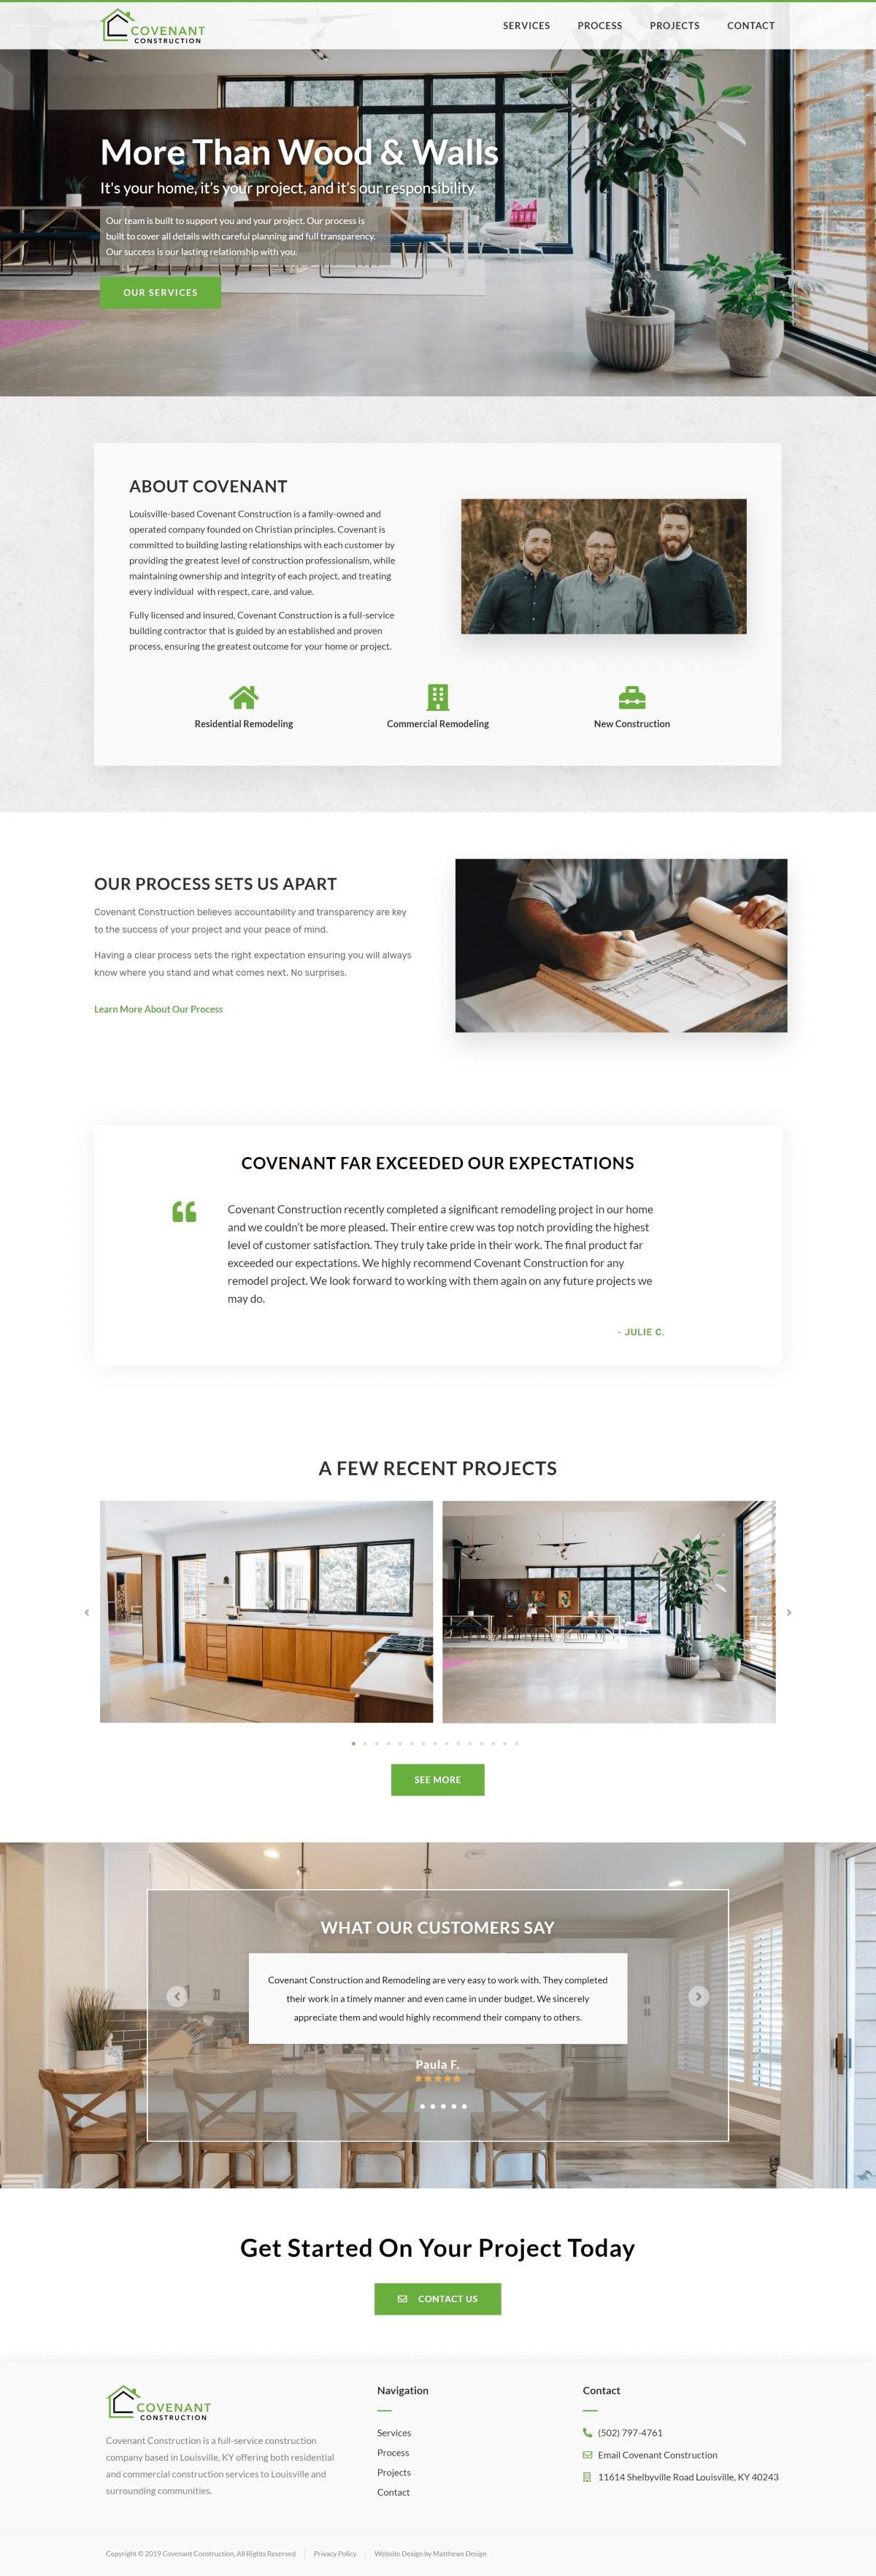 Covenant Construction Website Design by Matthews Design